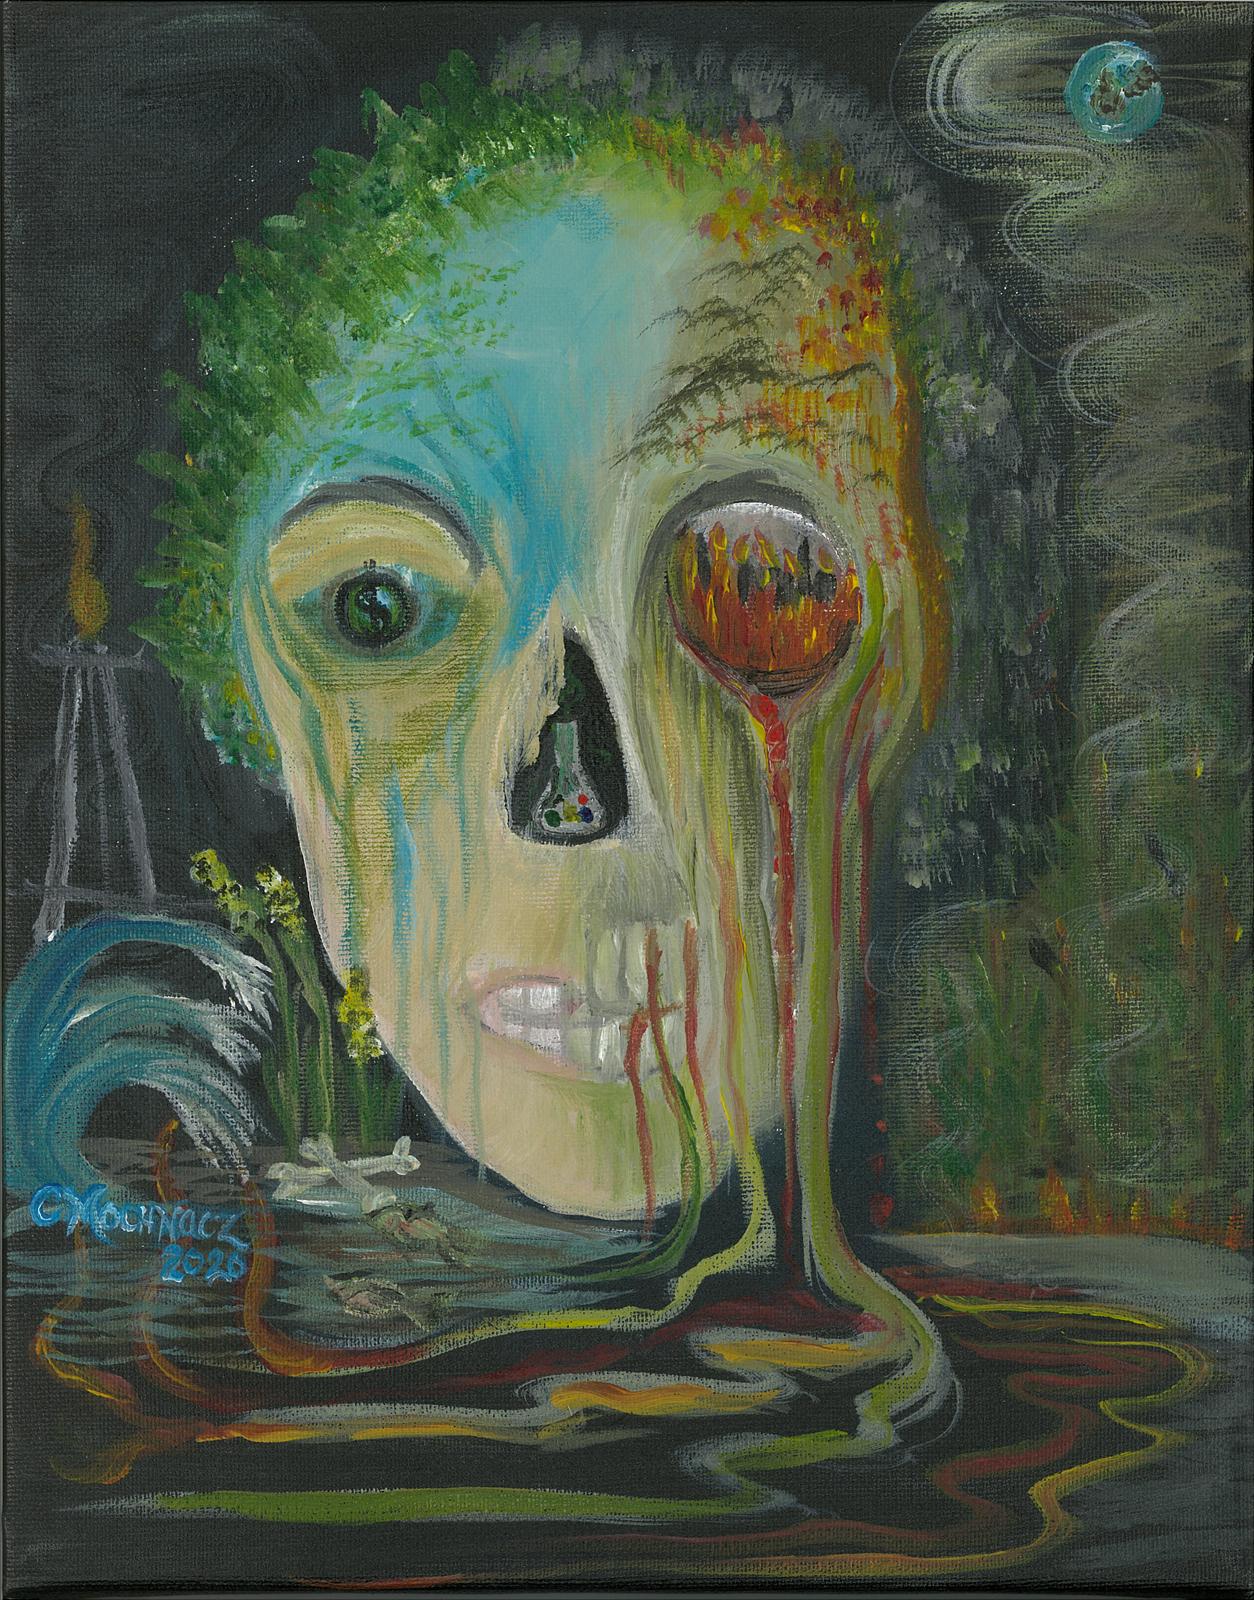 L'Abus de la Mere (Abuse of the Mother) - Carol Nettleton